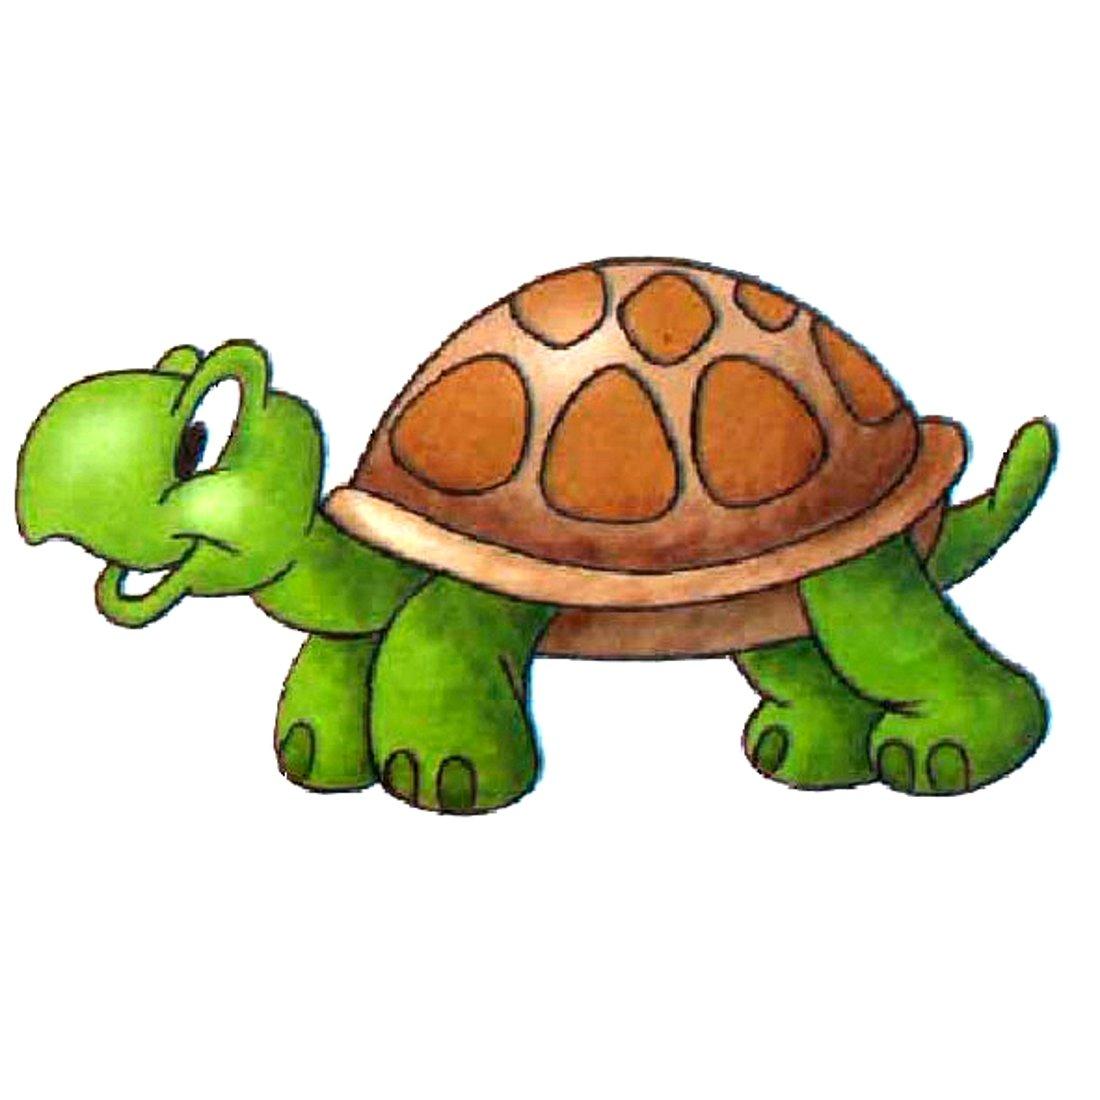 Картинки черепахи для дошкольников